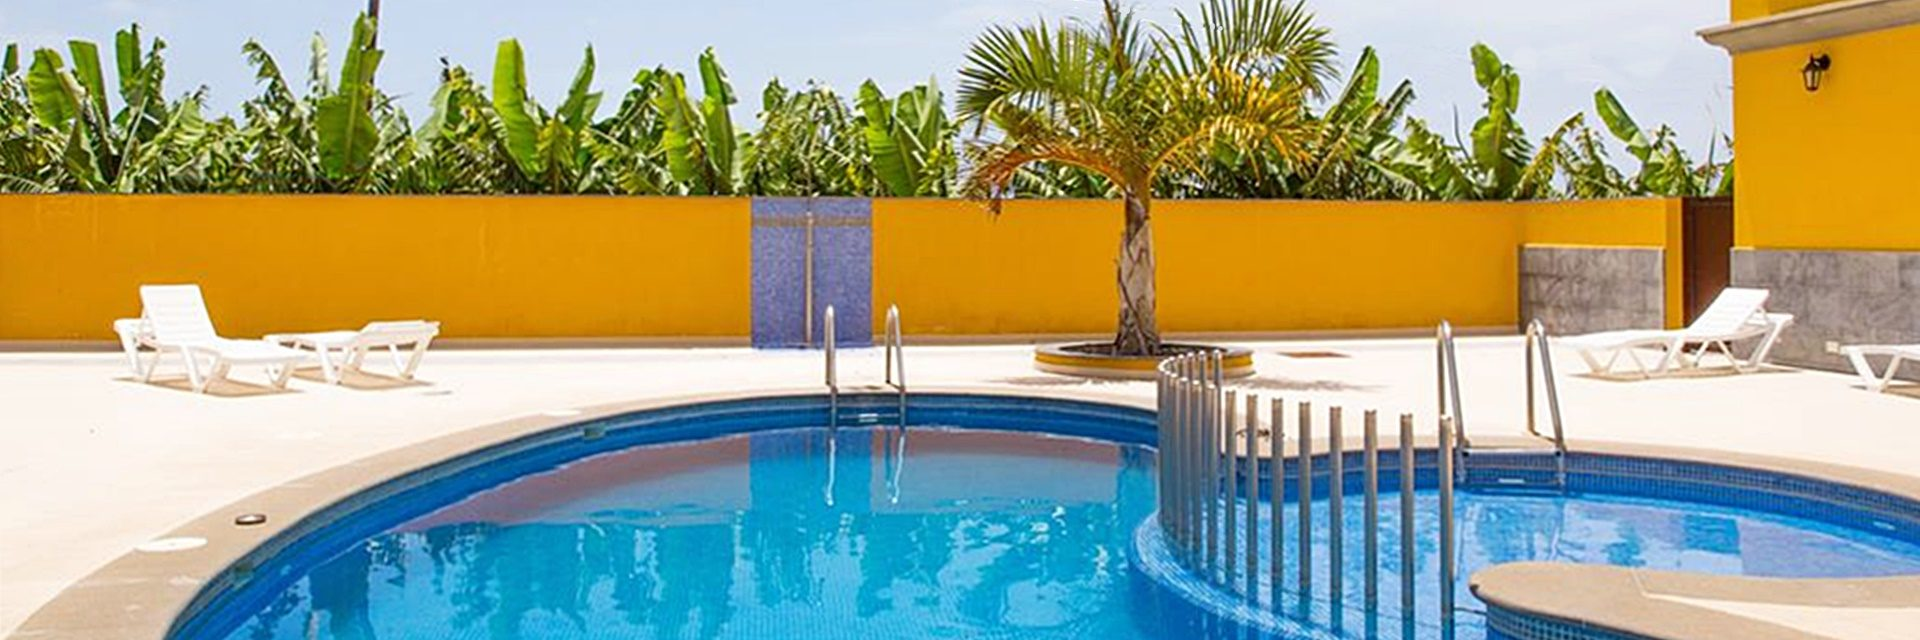 Holiday Apartment Belair - Tazacorte - La Palma